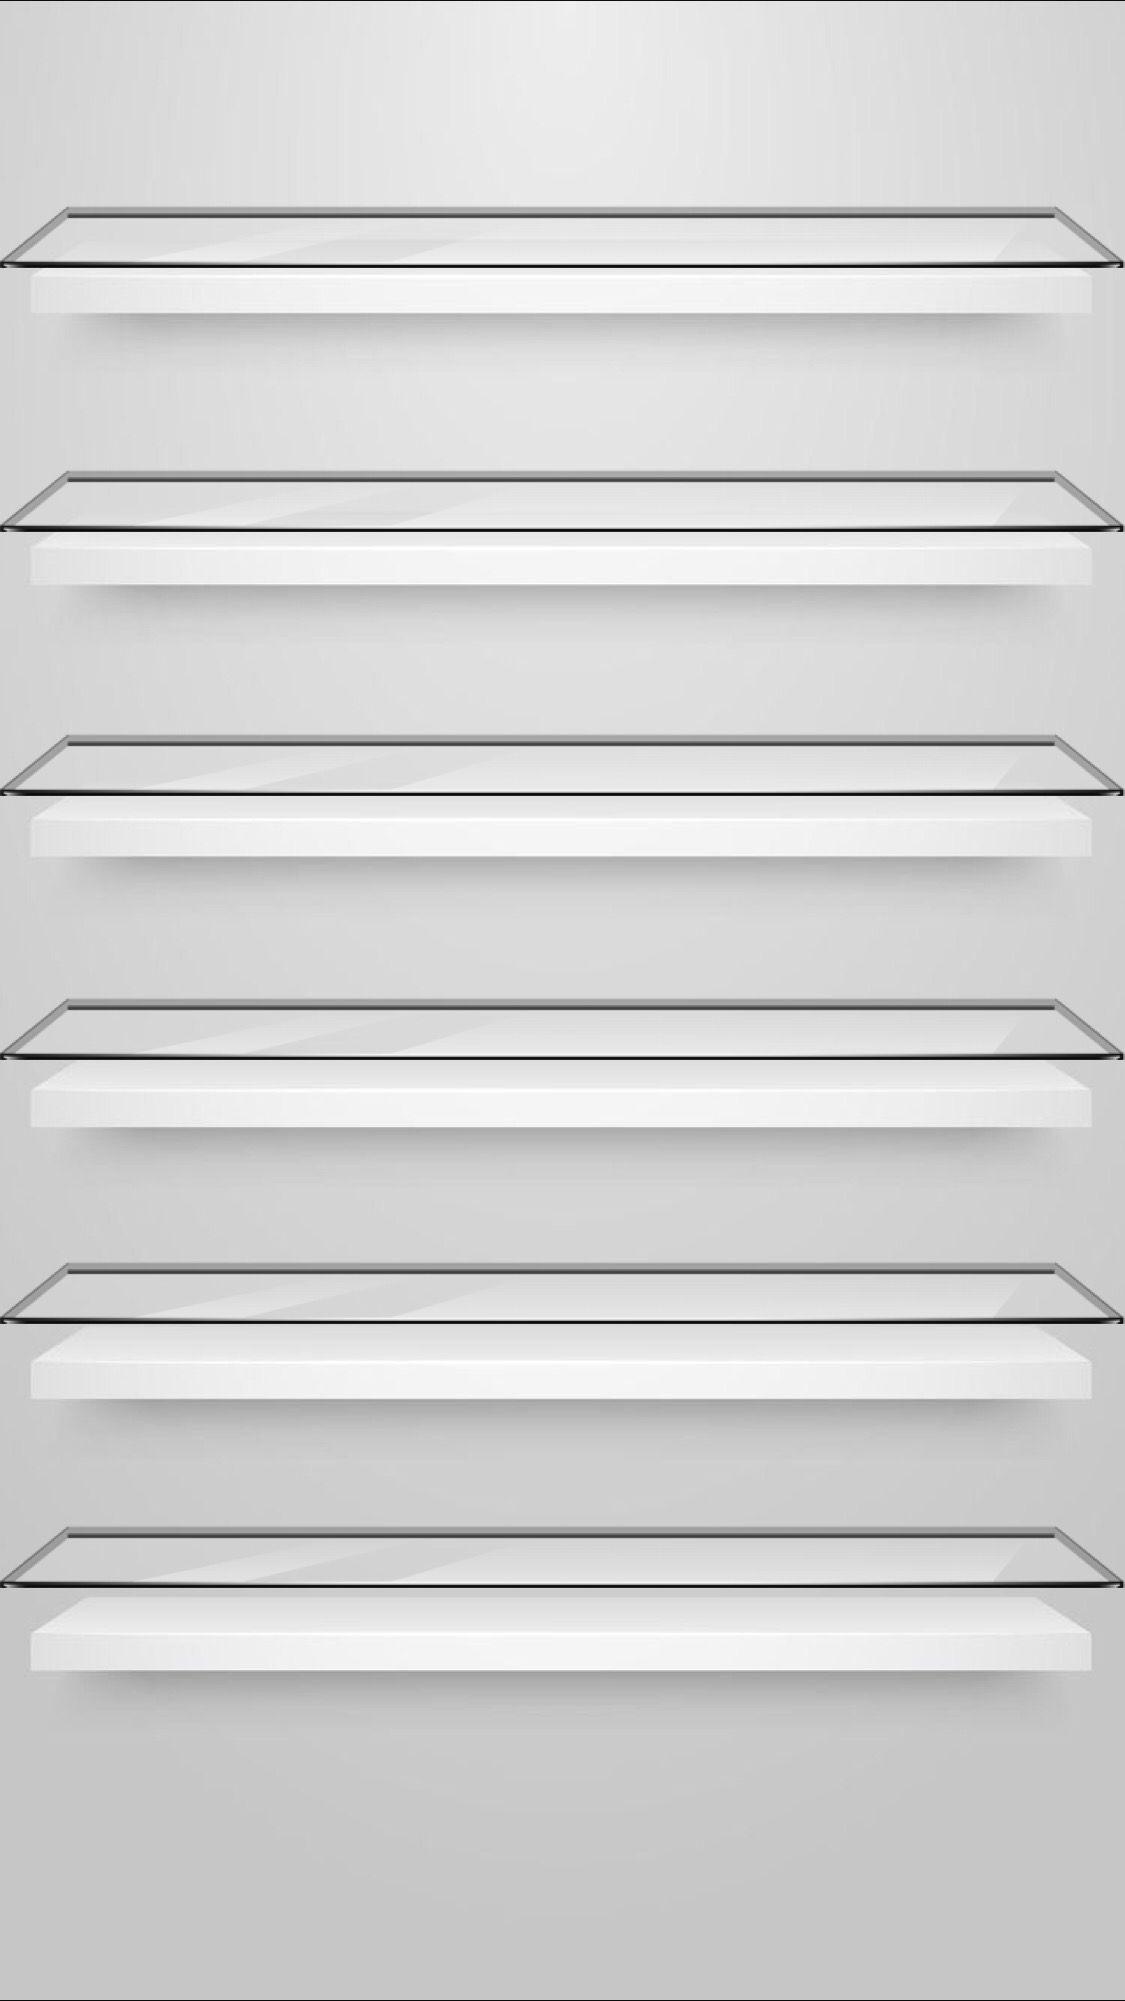 Iphone 6s Plus Wallpaper By Me Enjoy Iphone7plus 壁紙 壁紙 Iphone シンプル Iphone6 壁紙